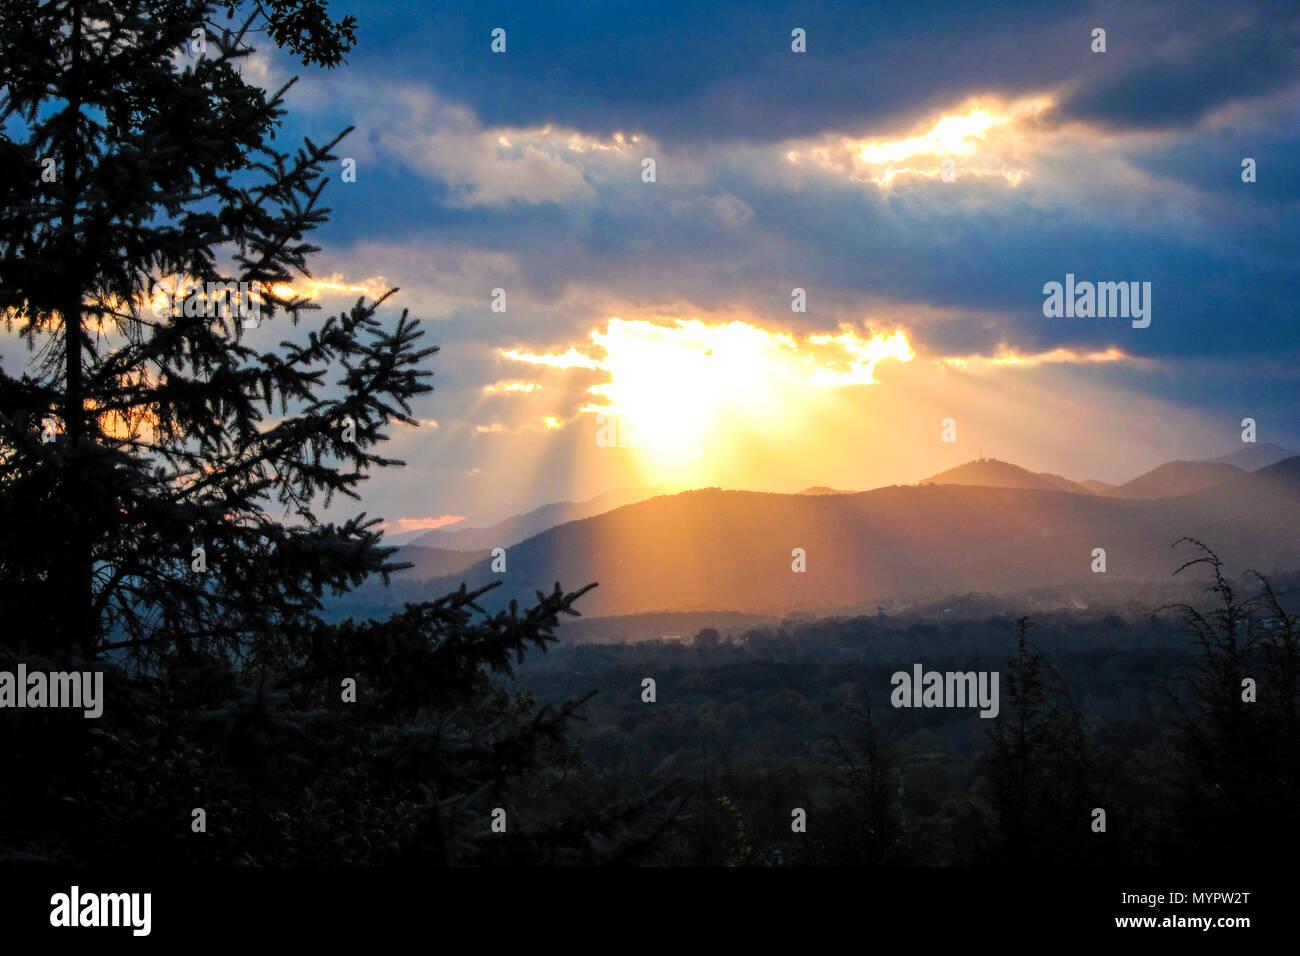 Sun rays illuminate the Blue Ridge Mountains through silhouette of Blue Spruce tree. Asheville, North Carolina. - Stock Image